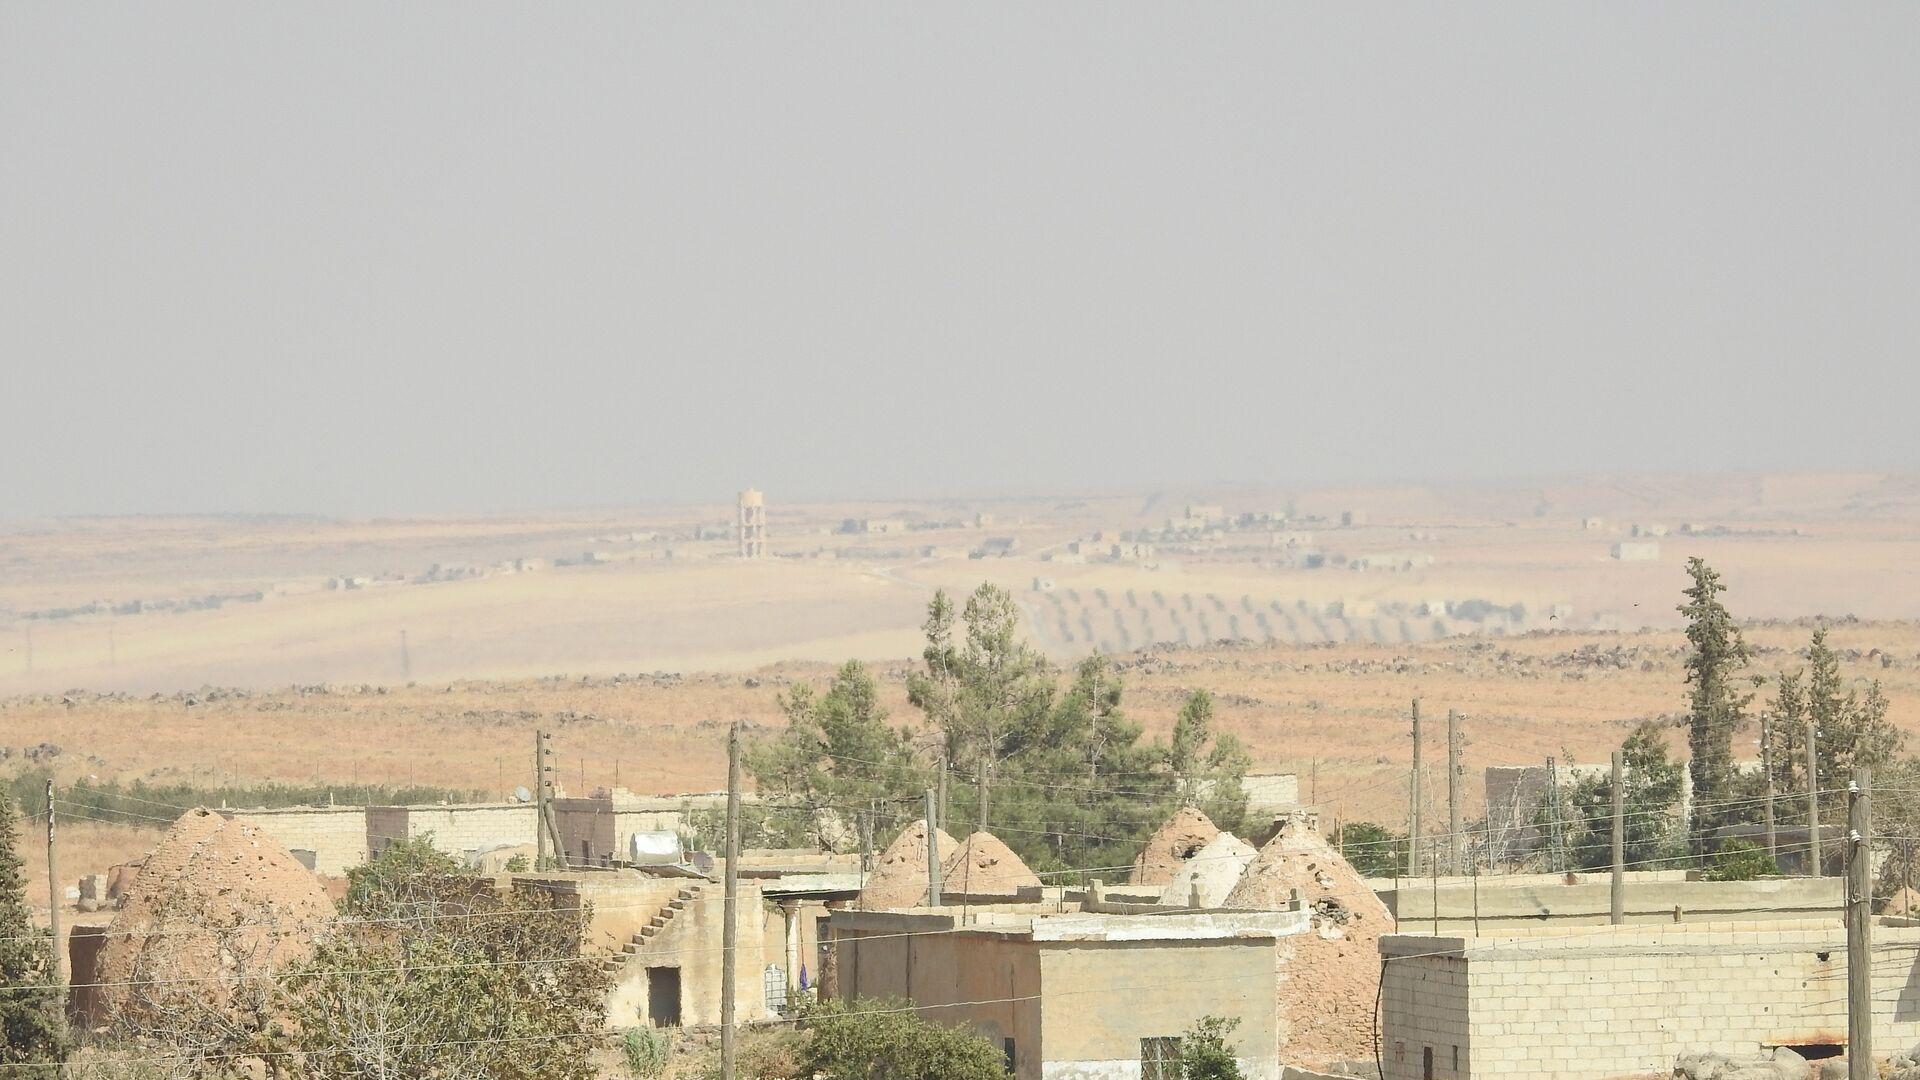 Situación en la provincia siria de Idlib - Sputnik Mundo, 1920, 15.03.2021